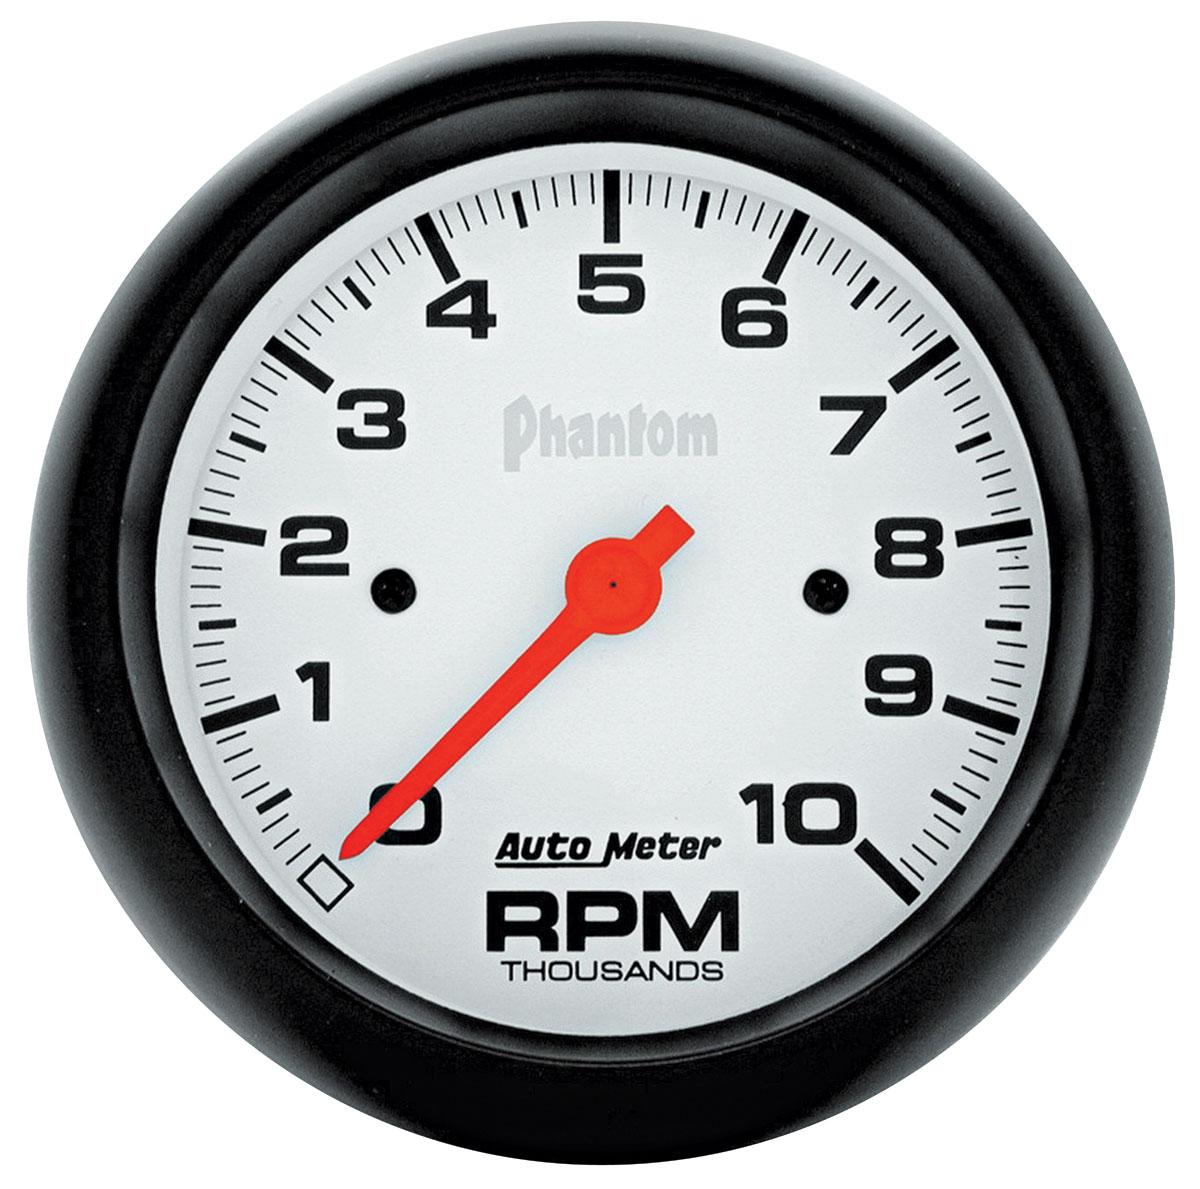 Gauge, Tachometer, Auto Meter, Phantom, 3-3/8